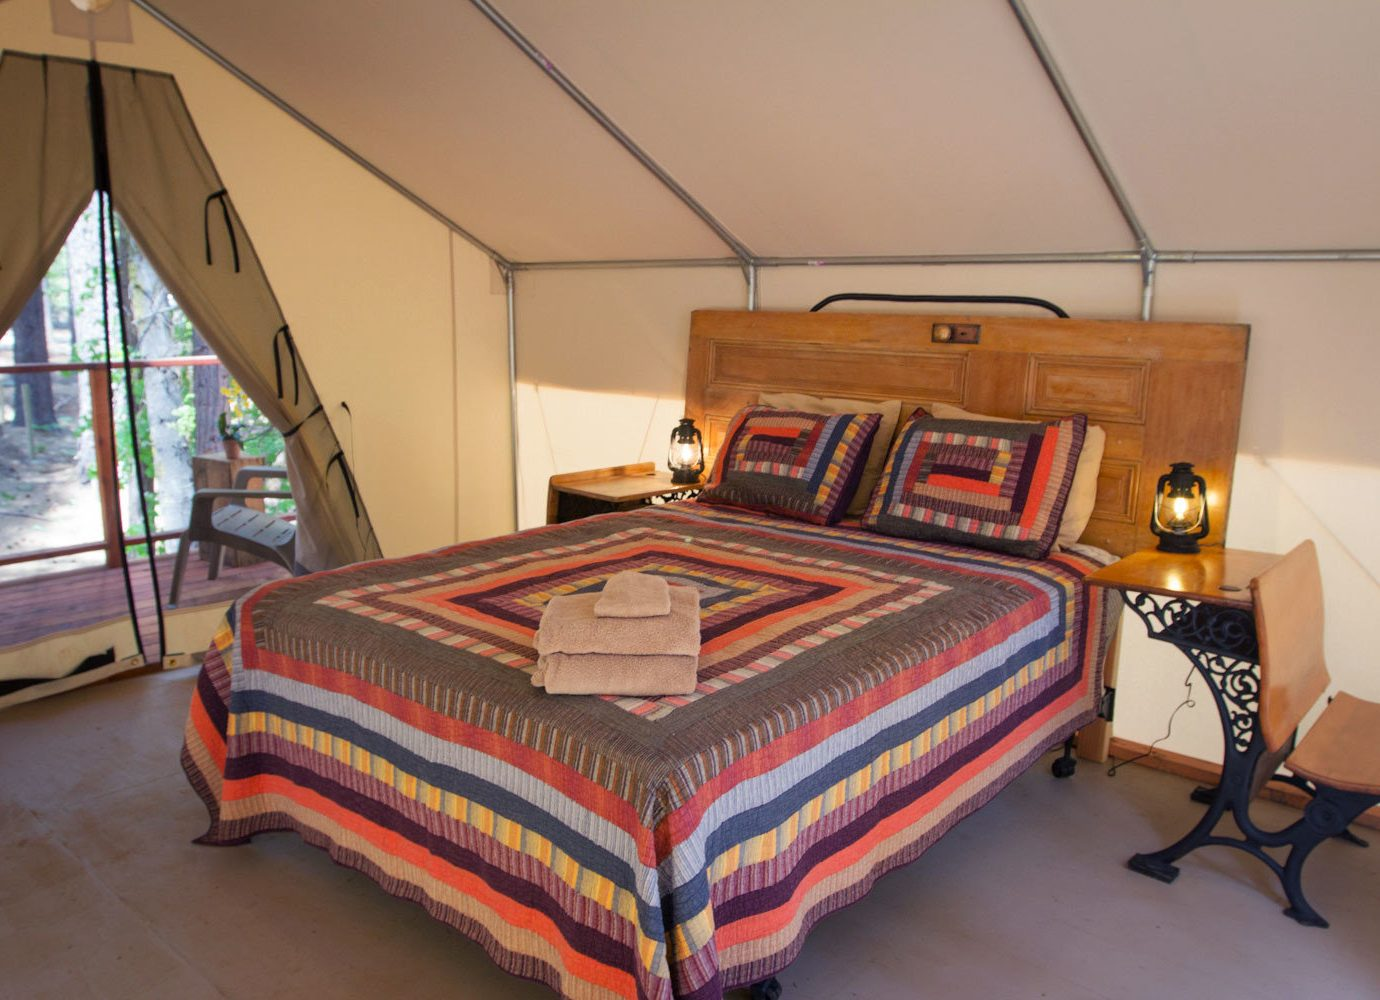 Glamping Luxury Travel Outdoors + Adventure floor indoor wall room Bedroom property bed furniture bed sheet cottage interior design